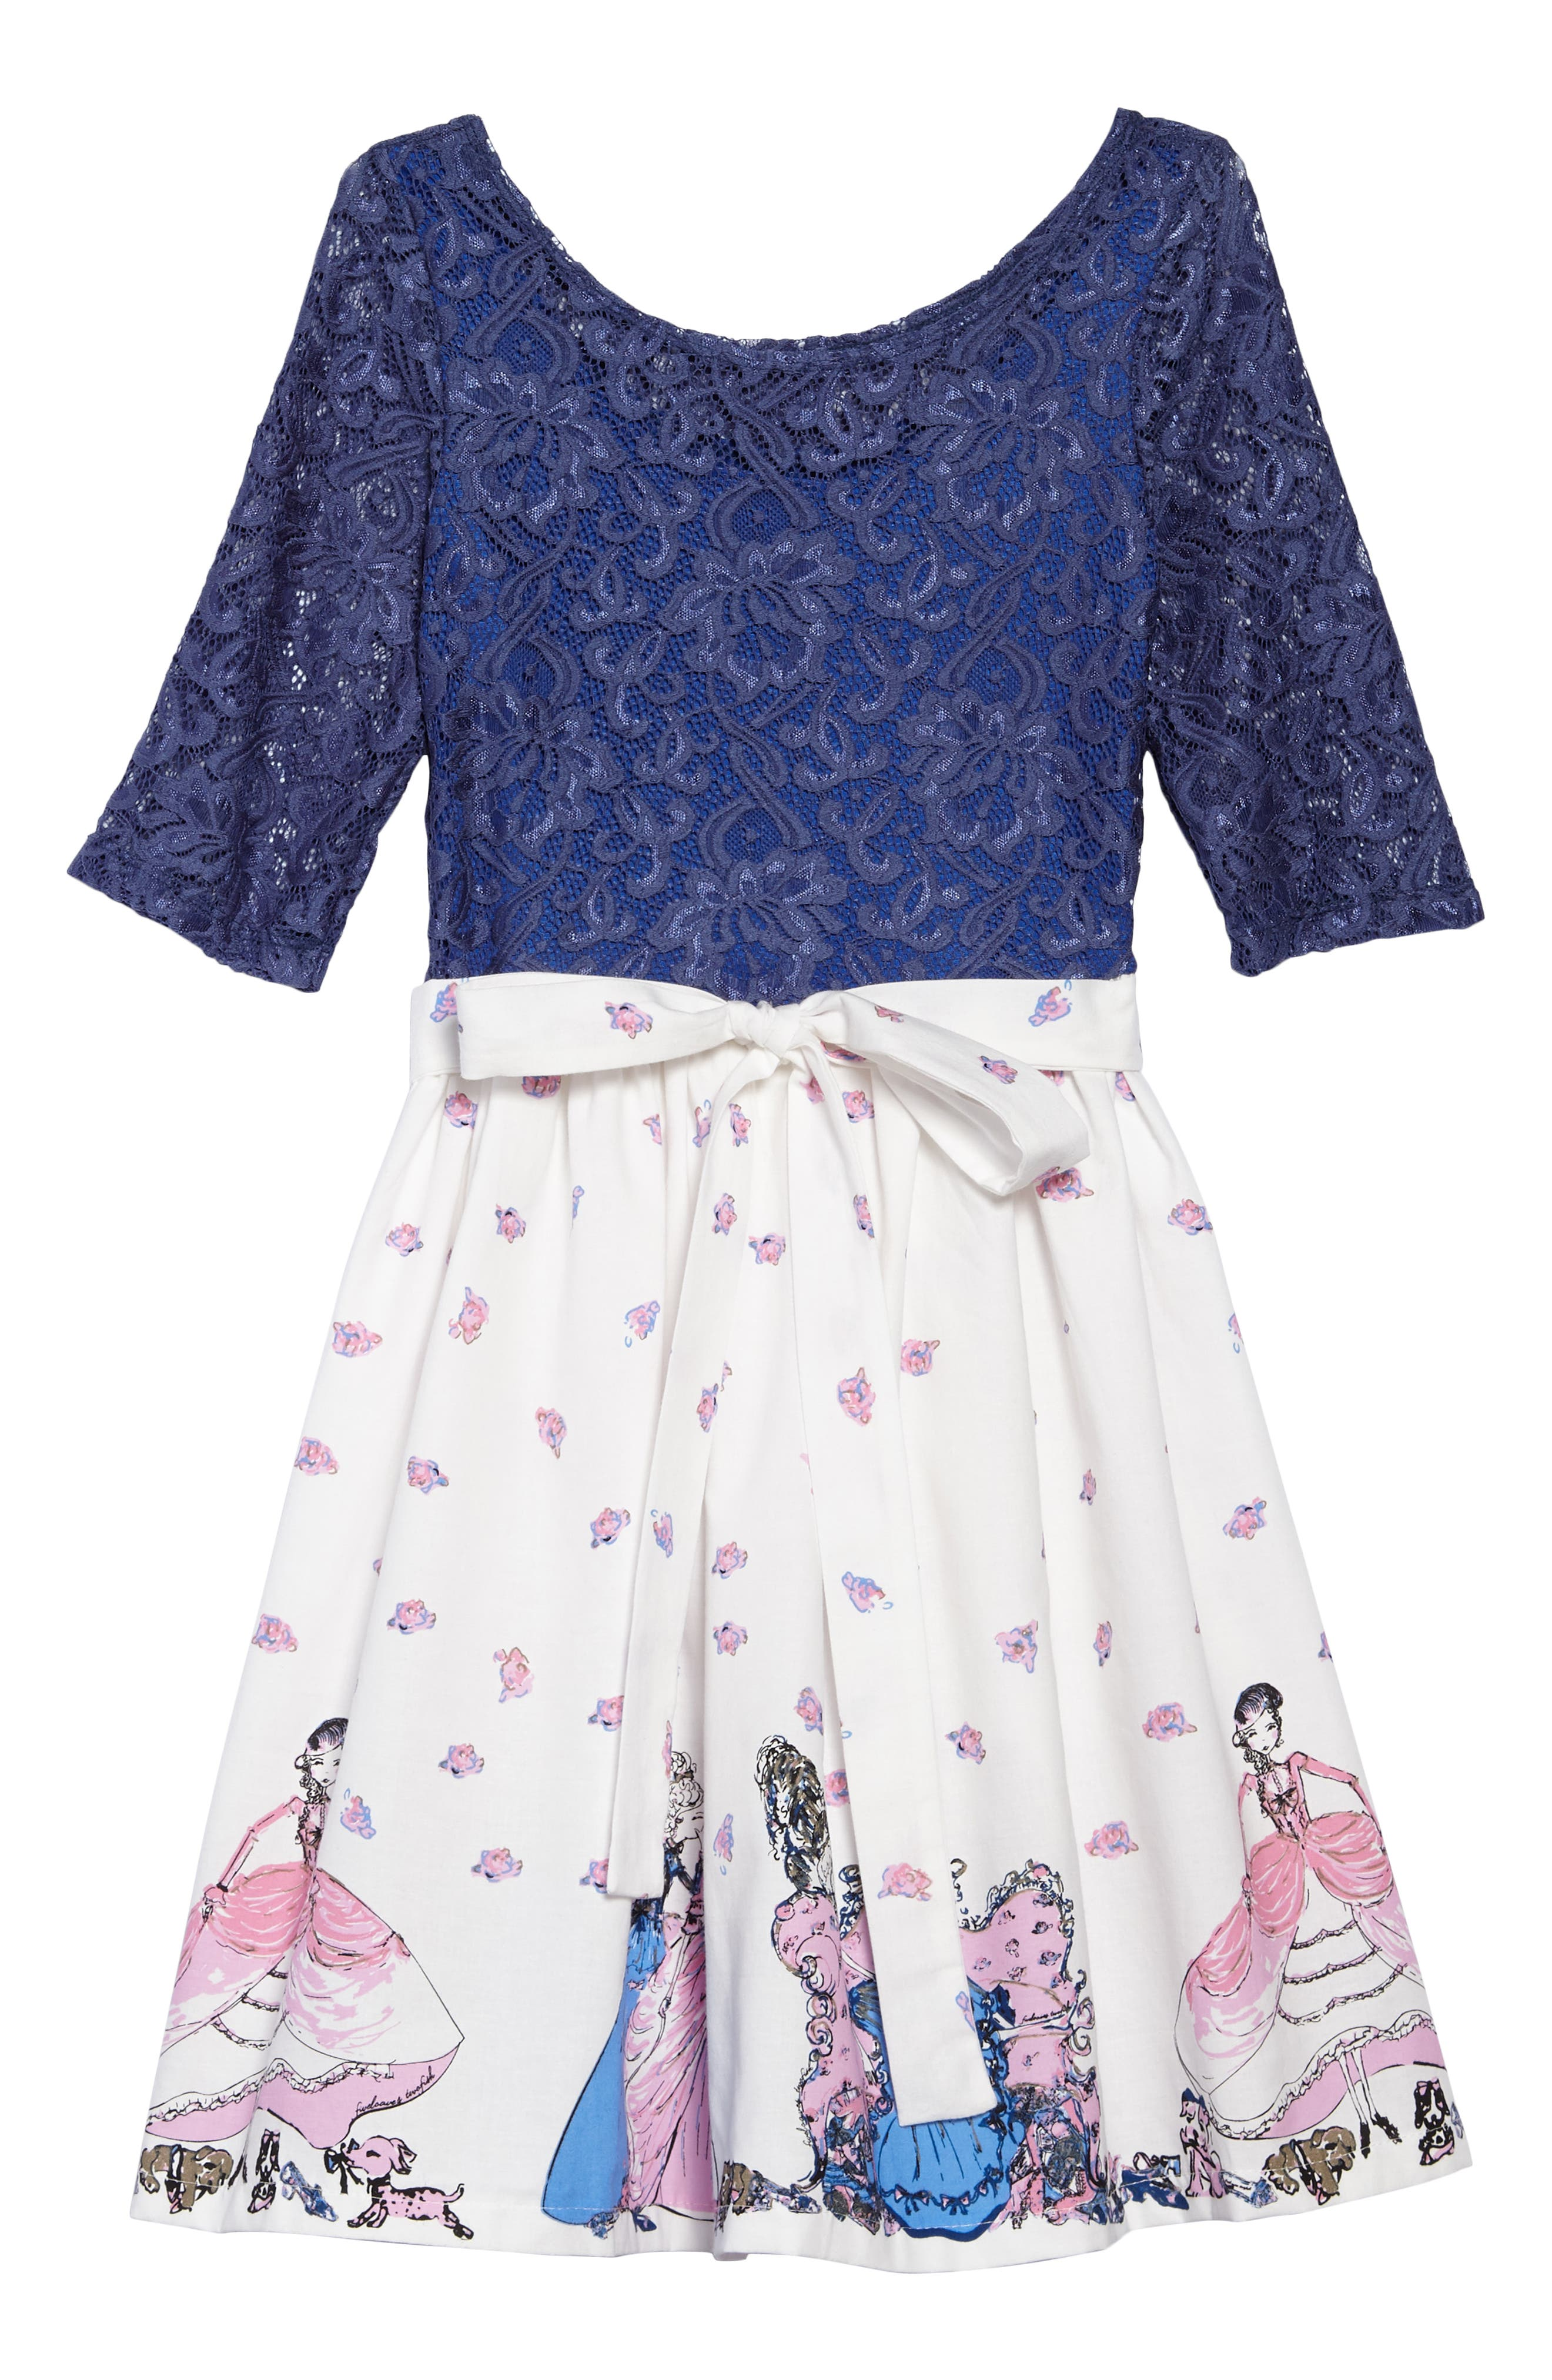 Abbie Girl & Her Shoes Dress,                             Alternate thumbnail 2, color,                             400